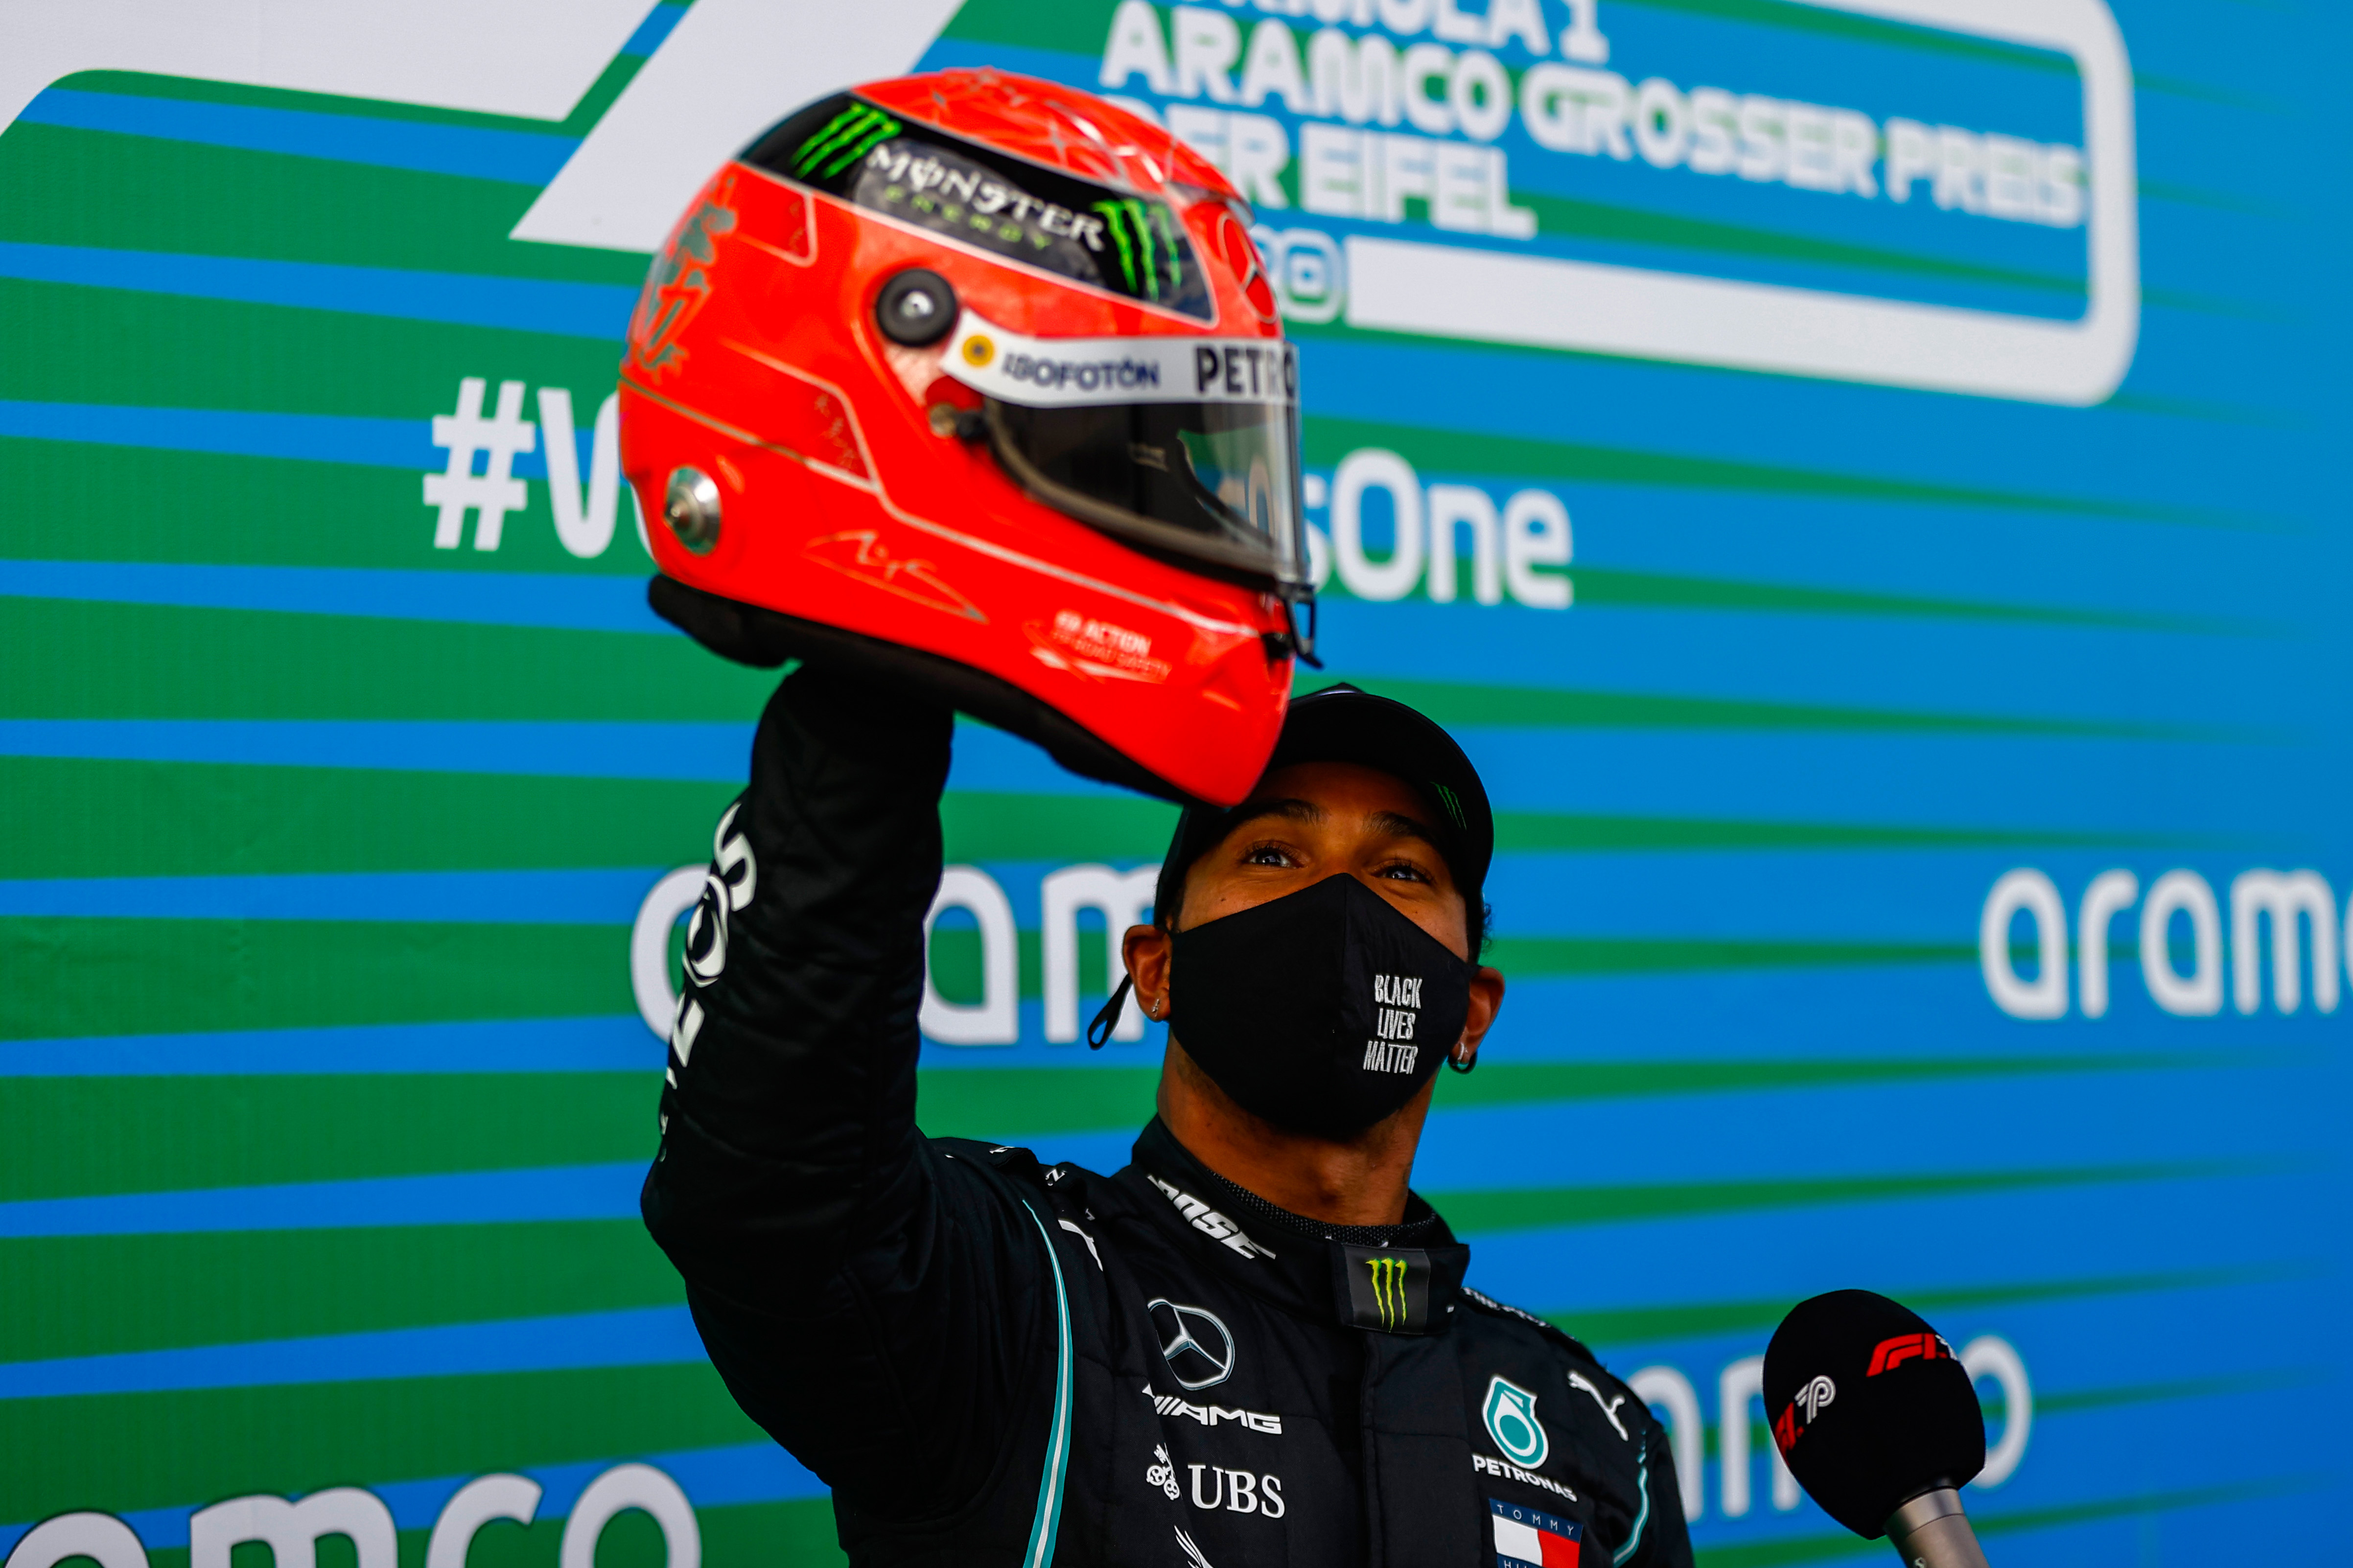 Lewis Hamilton Mick Schumacher helmet